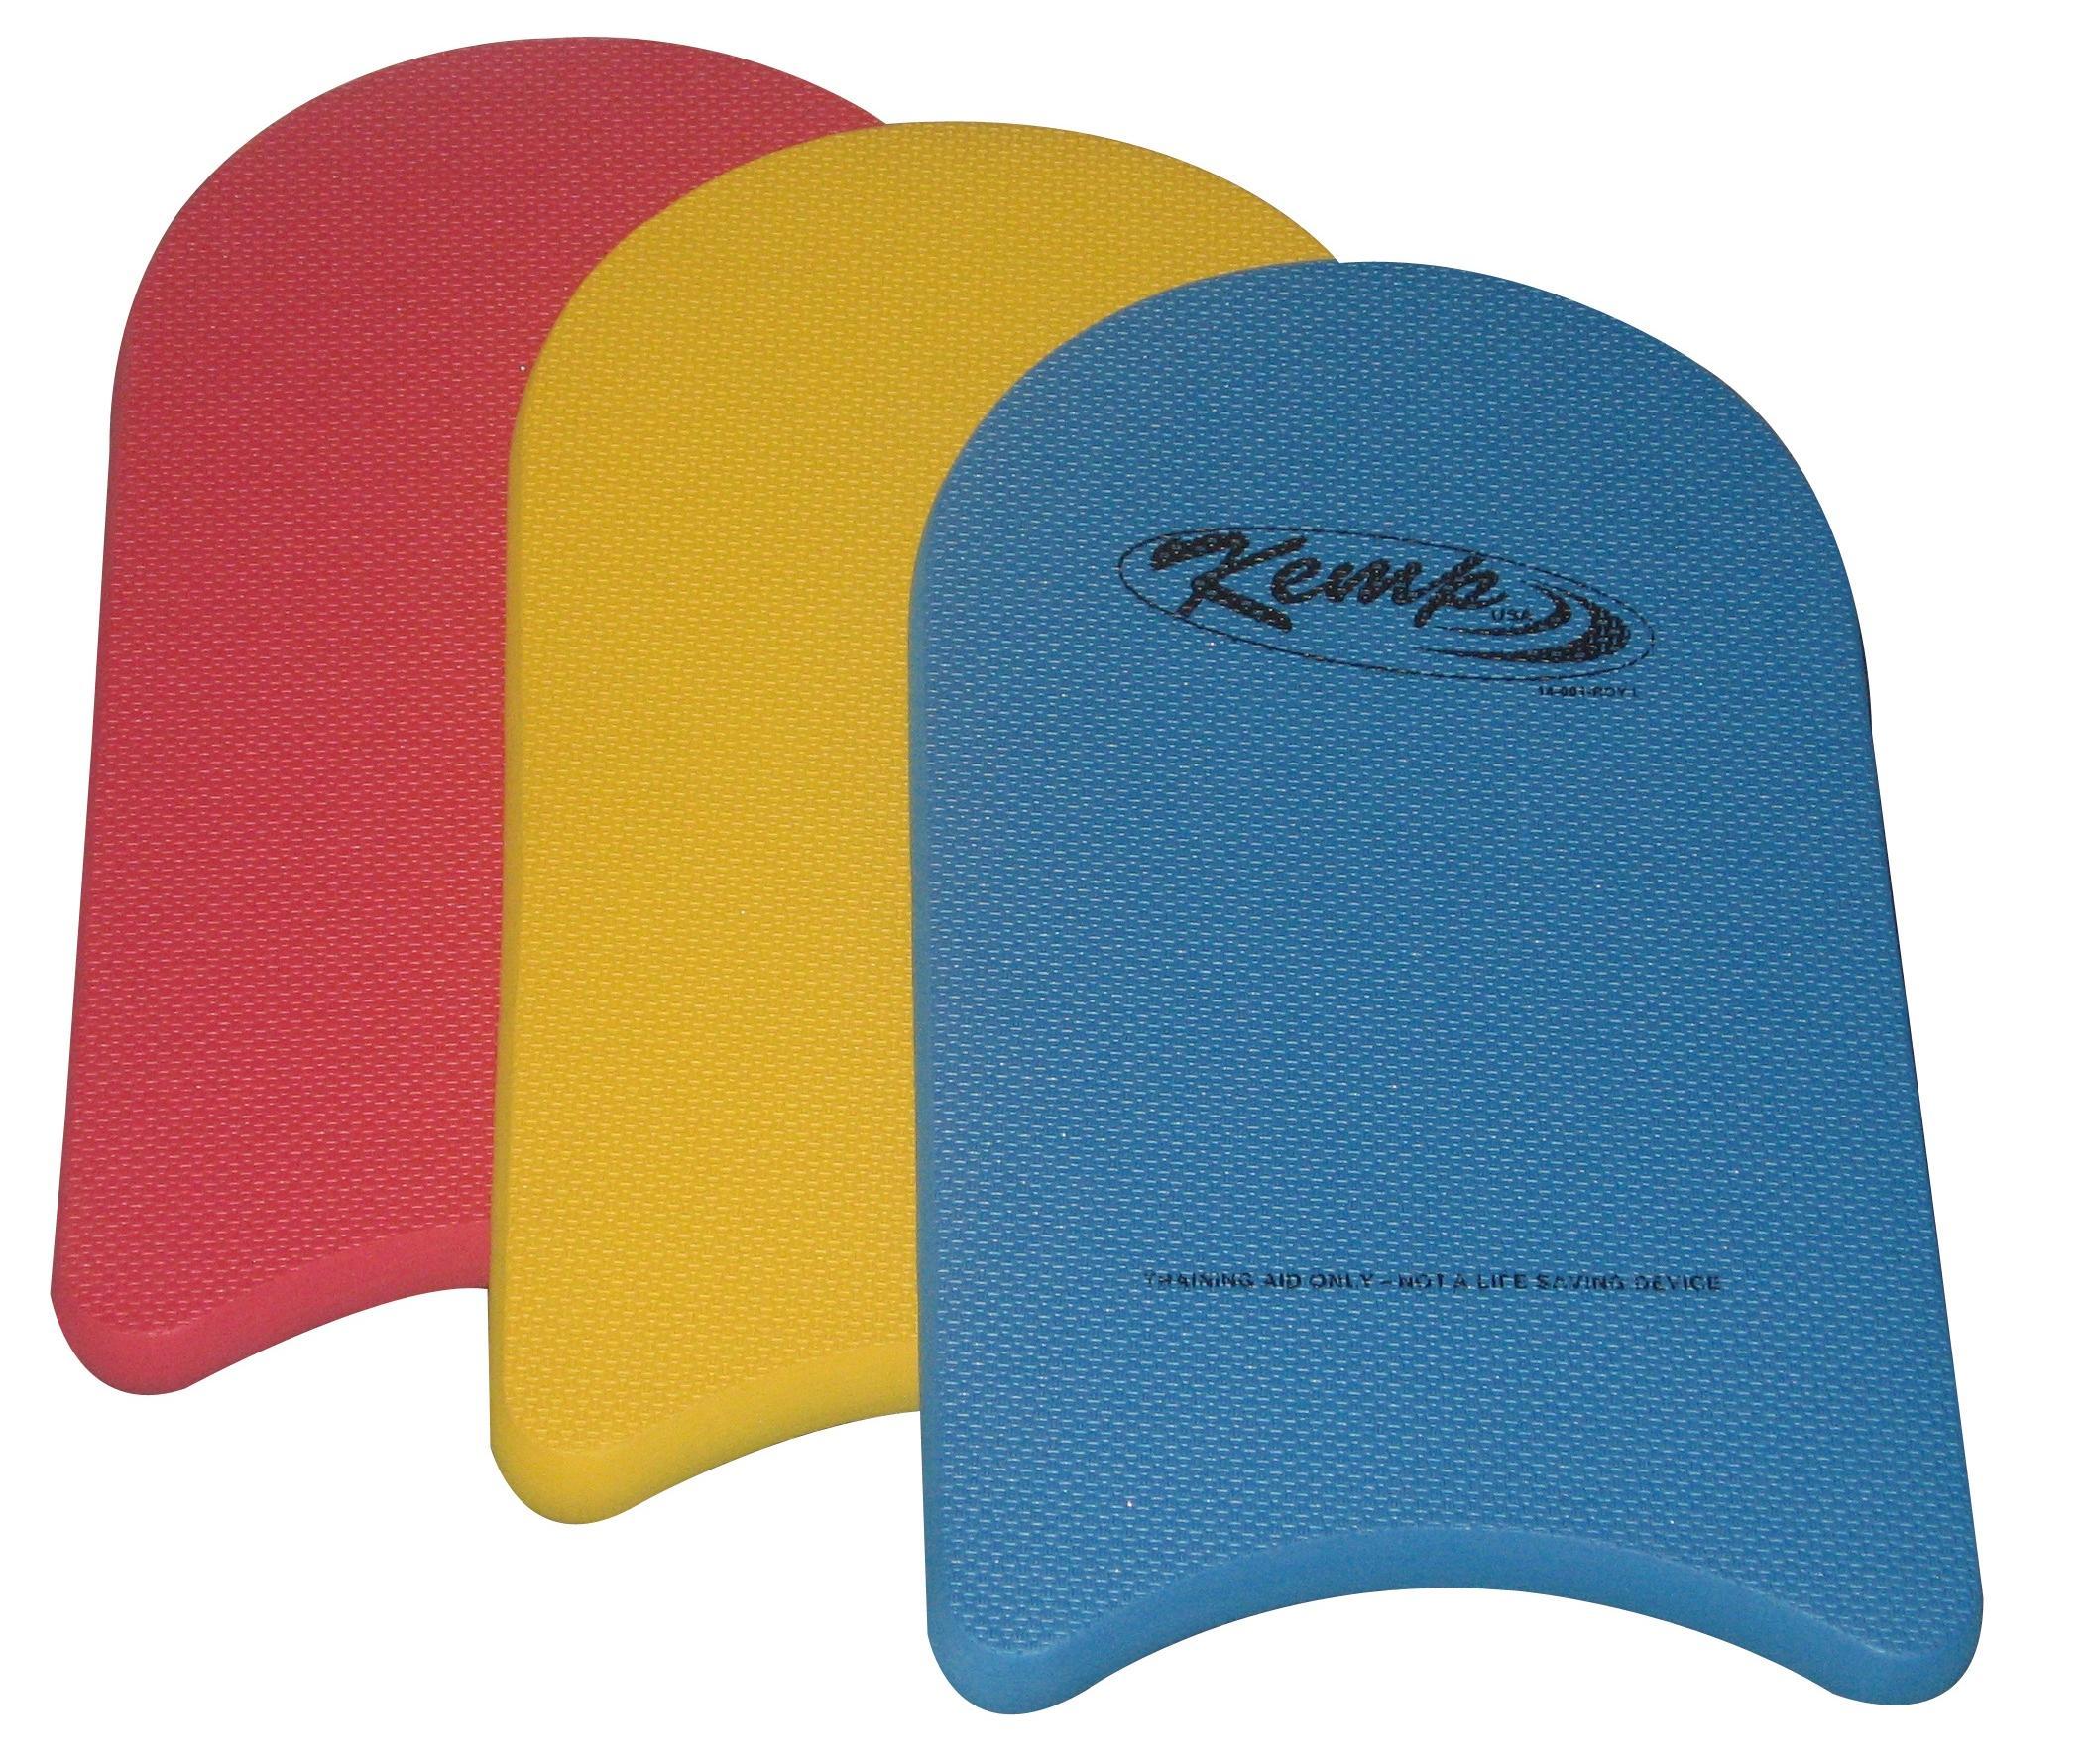 Kickboards